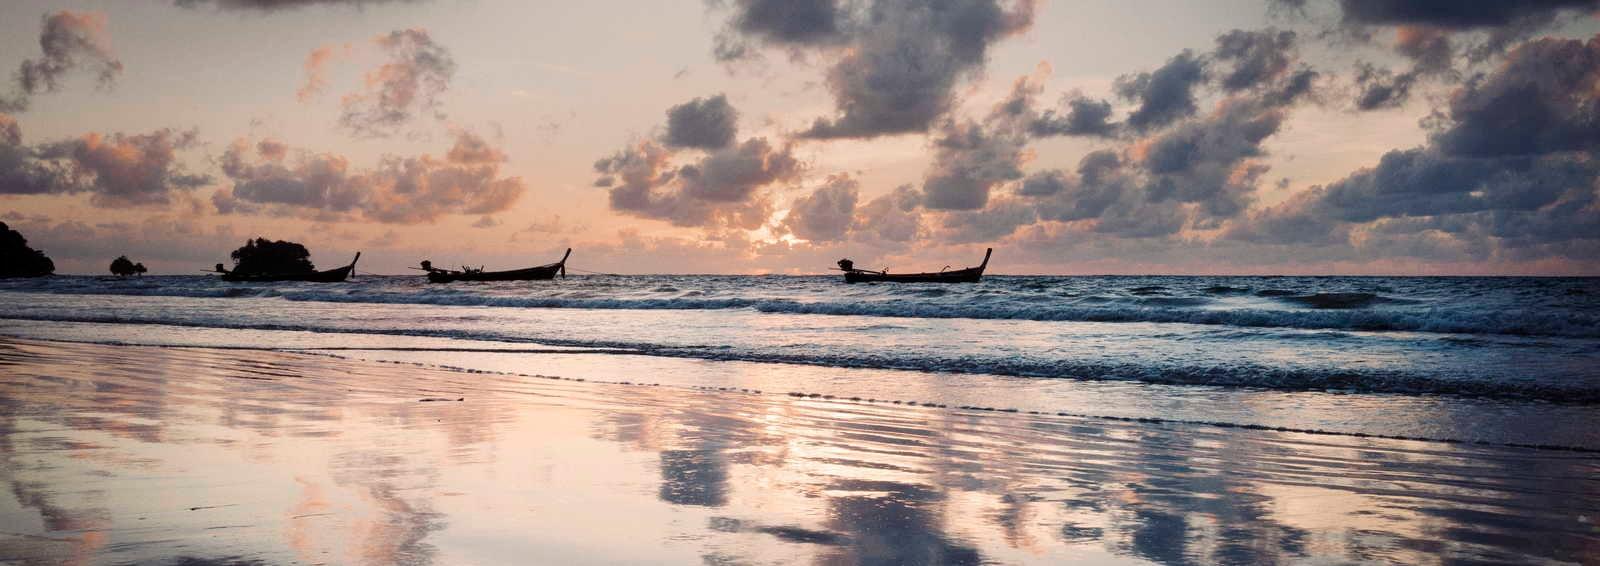 Traditional fishing boats, Vietnam